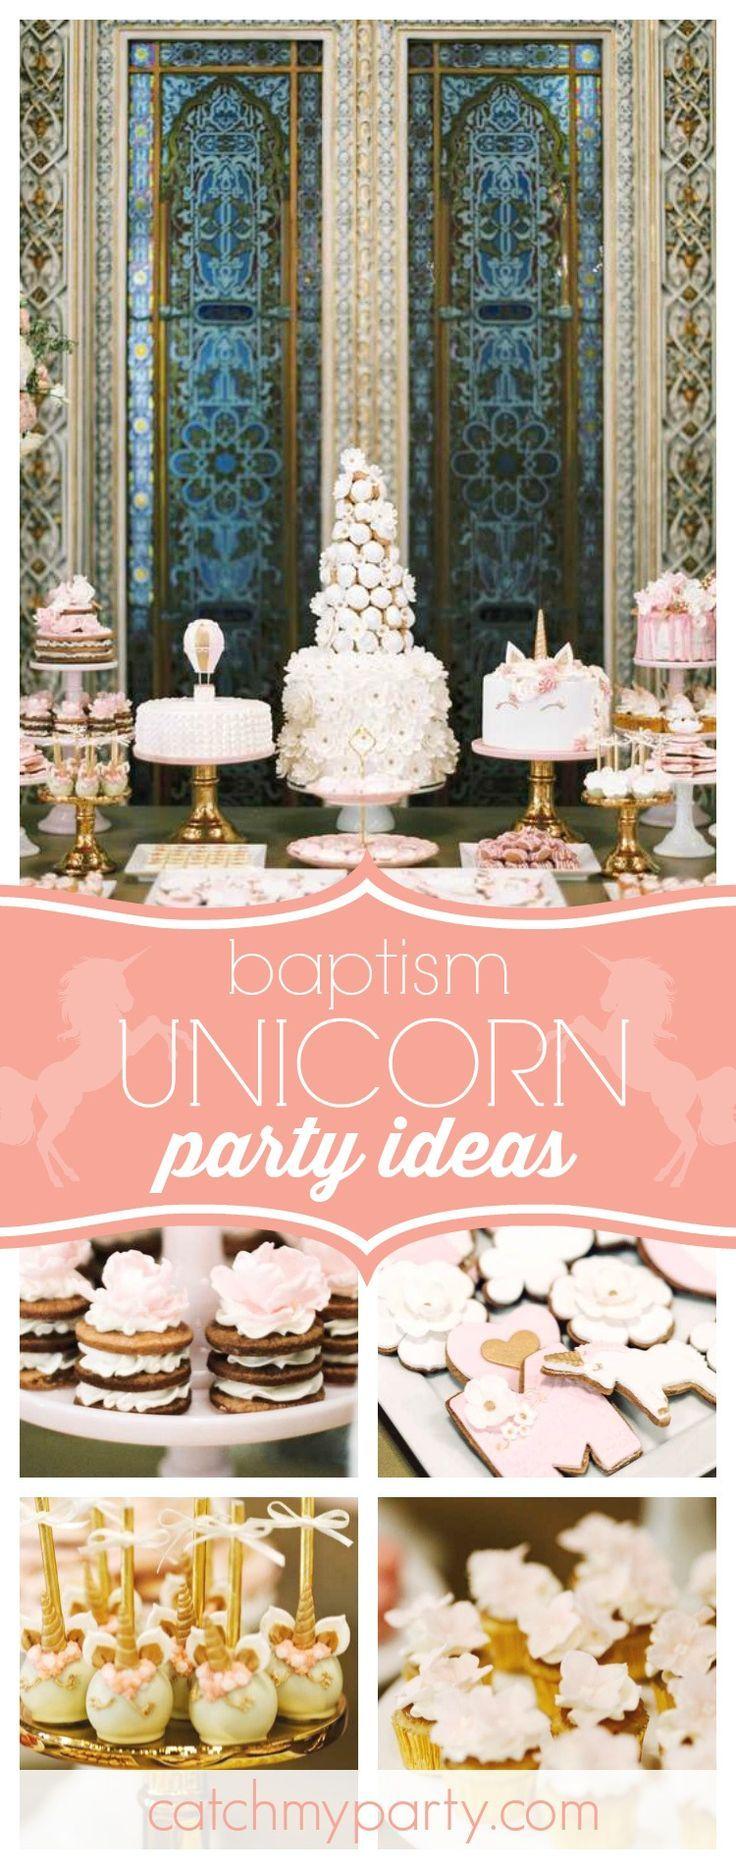 Take a look at this glamorous unicorn baptism!